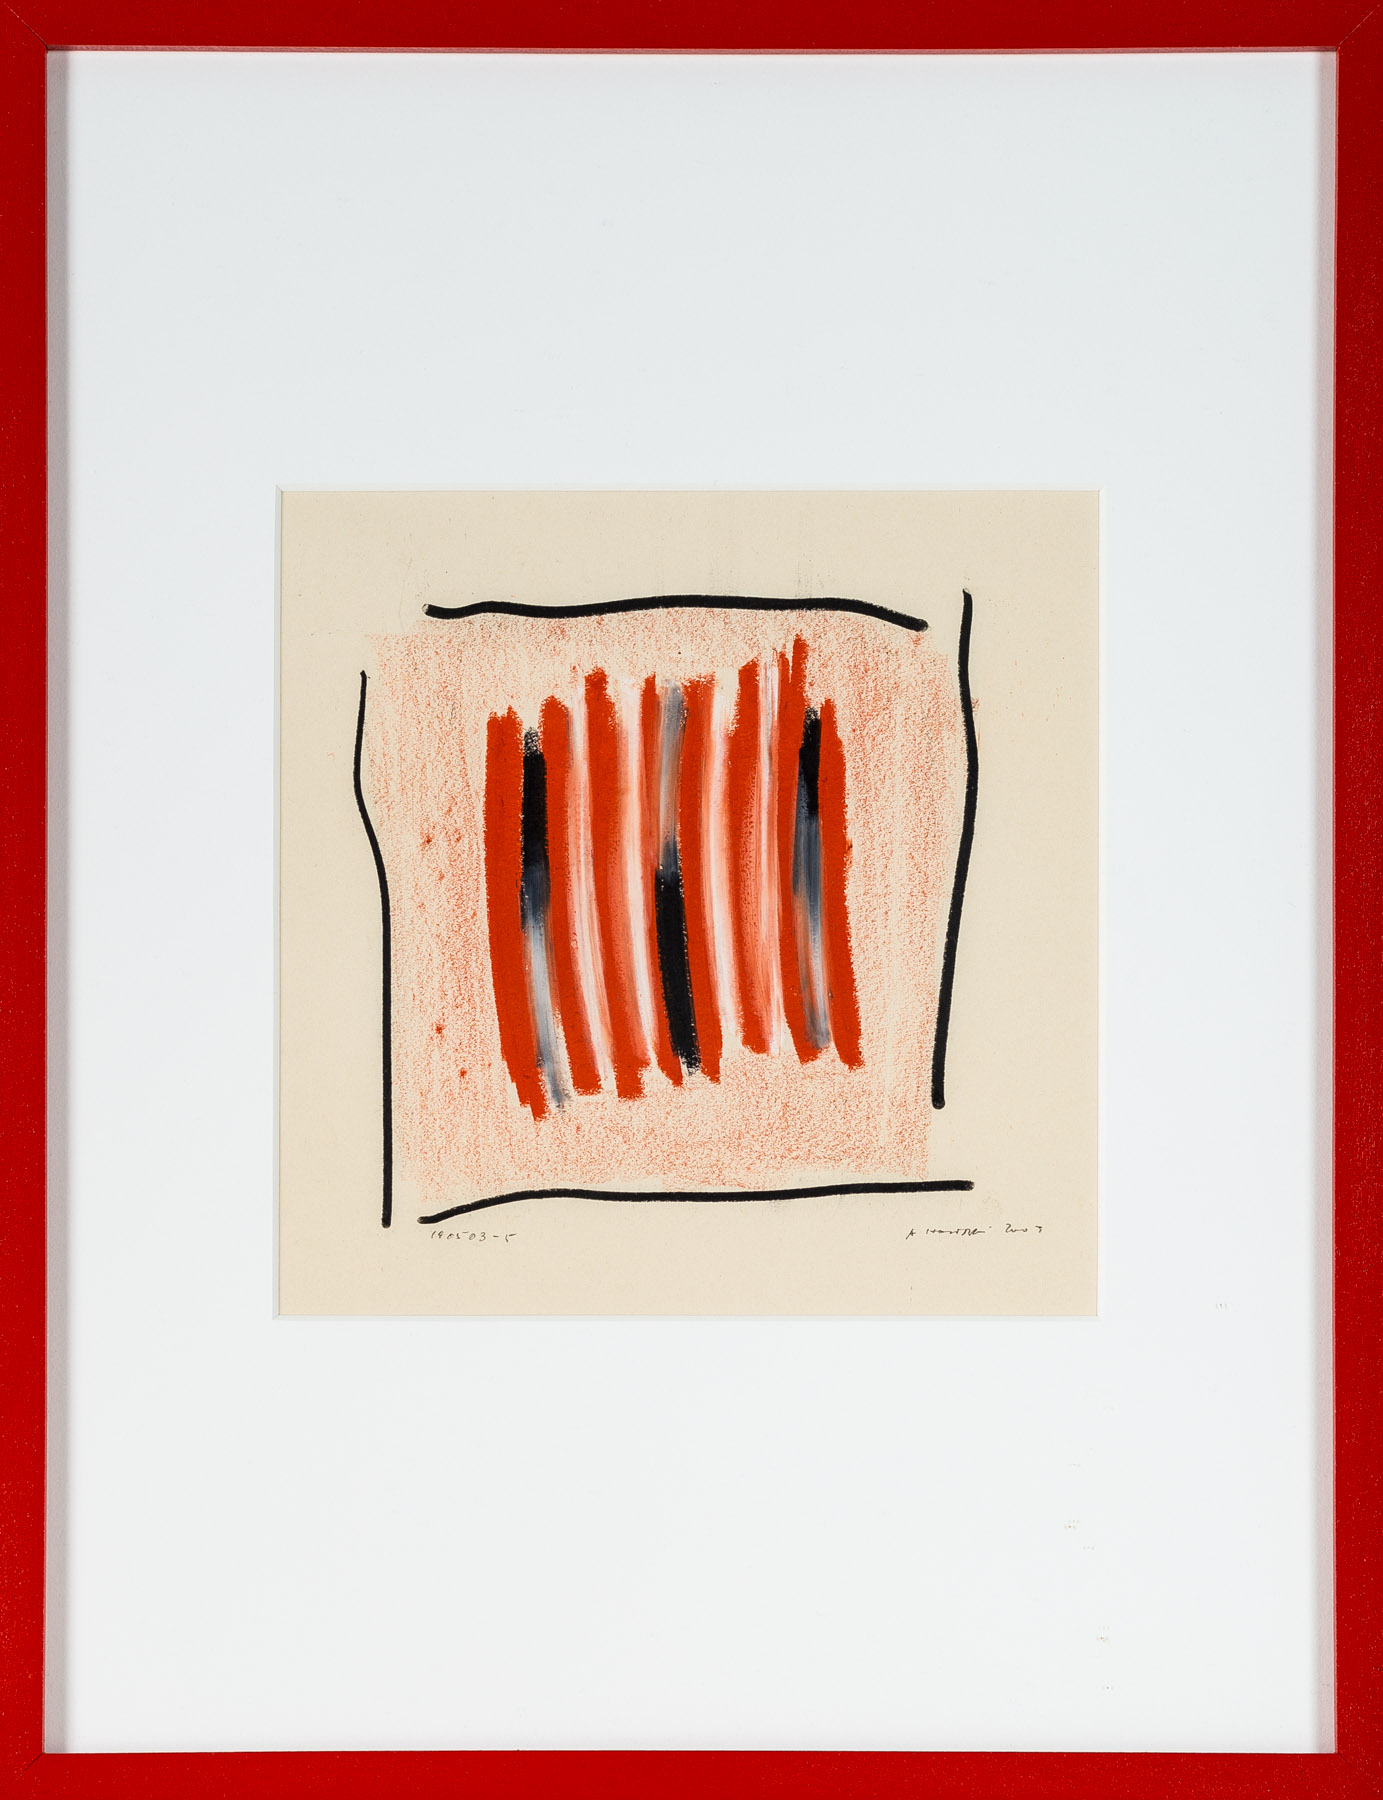 Bez tytułu, 2005